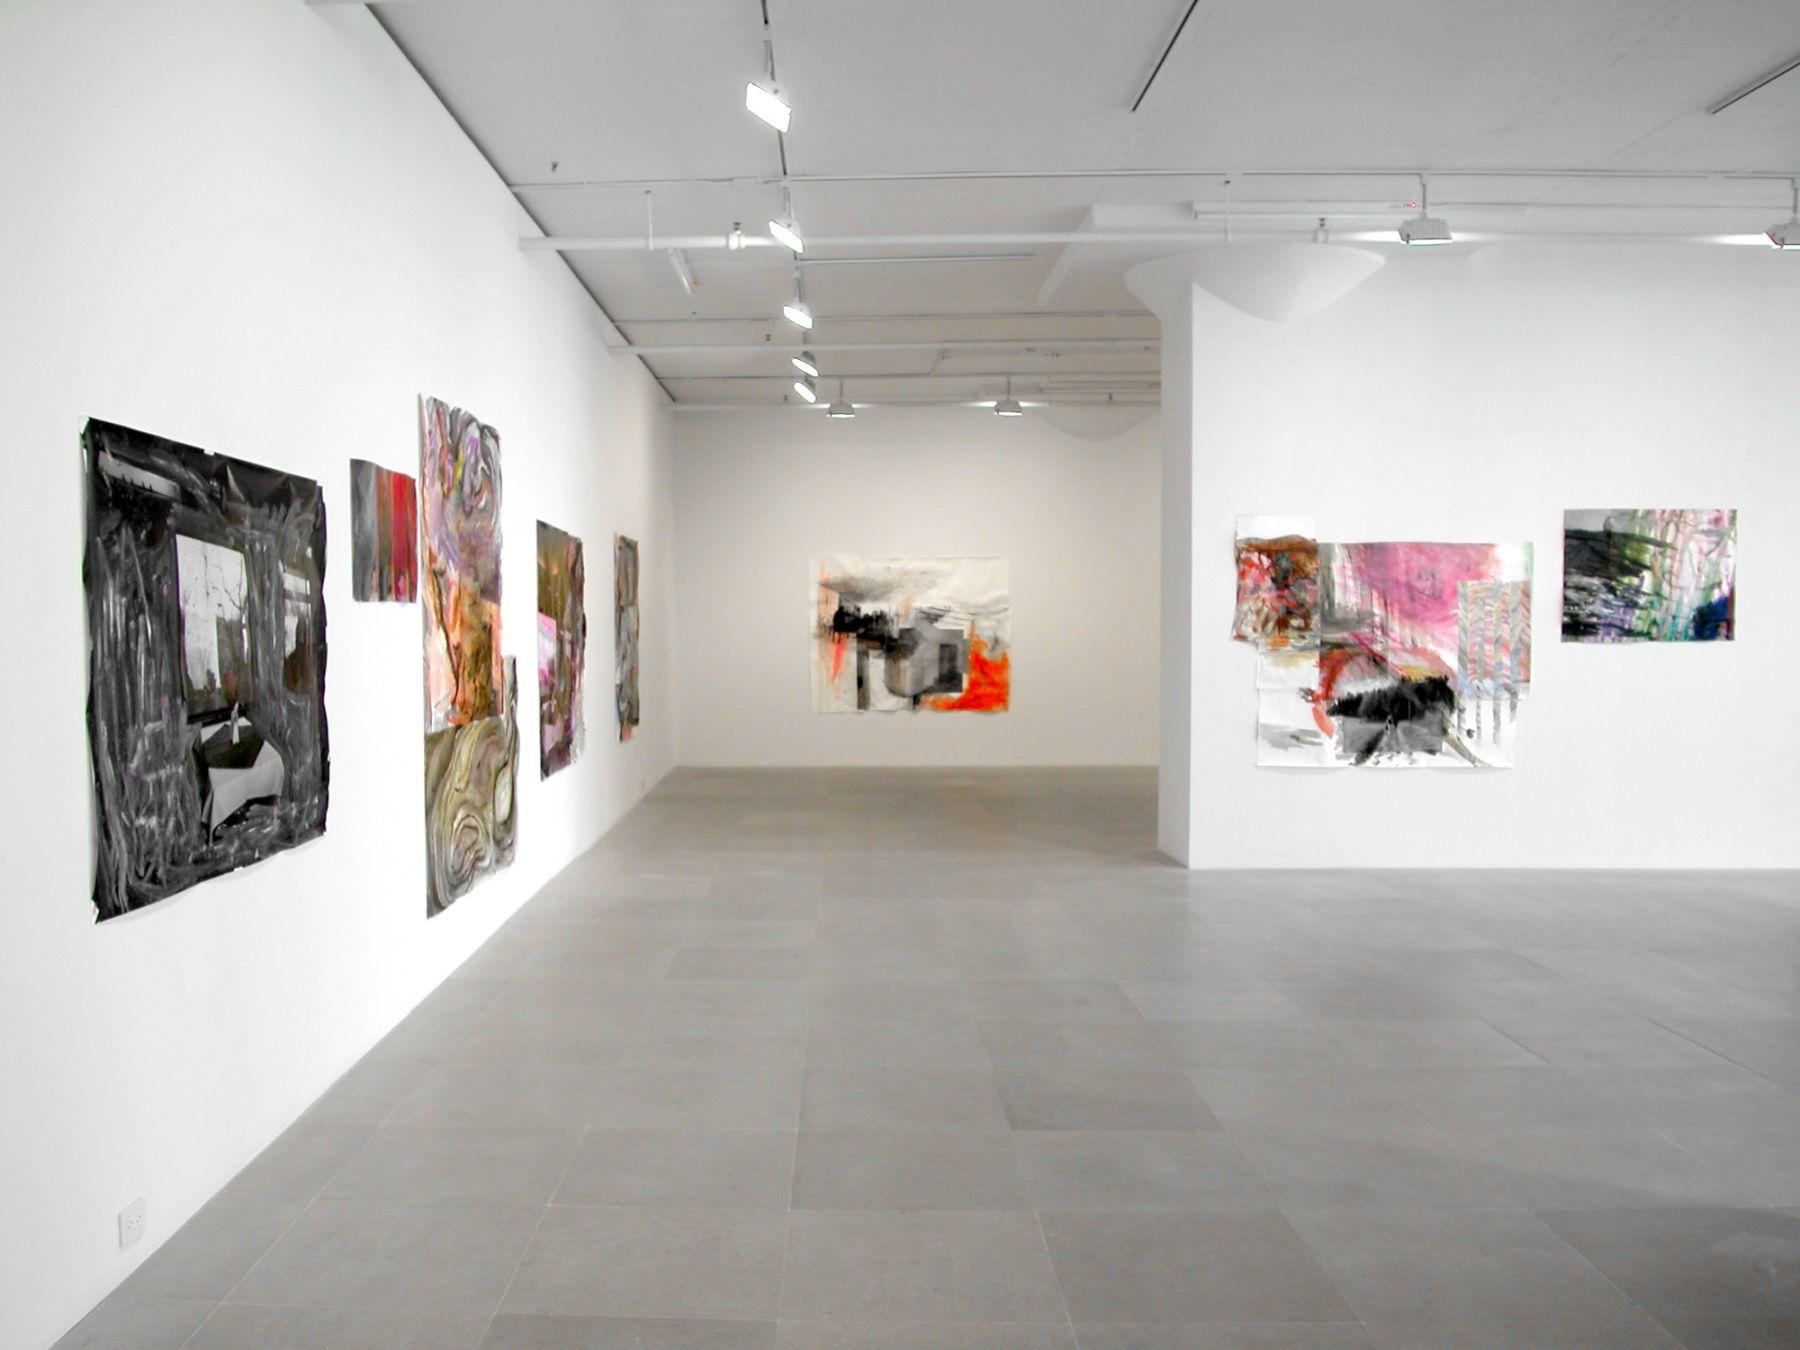 Installation view, Greene Naftali, New York, 2007